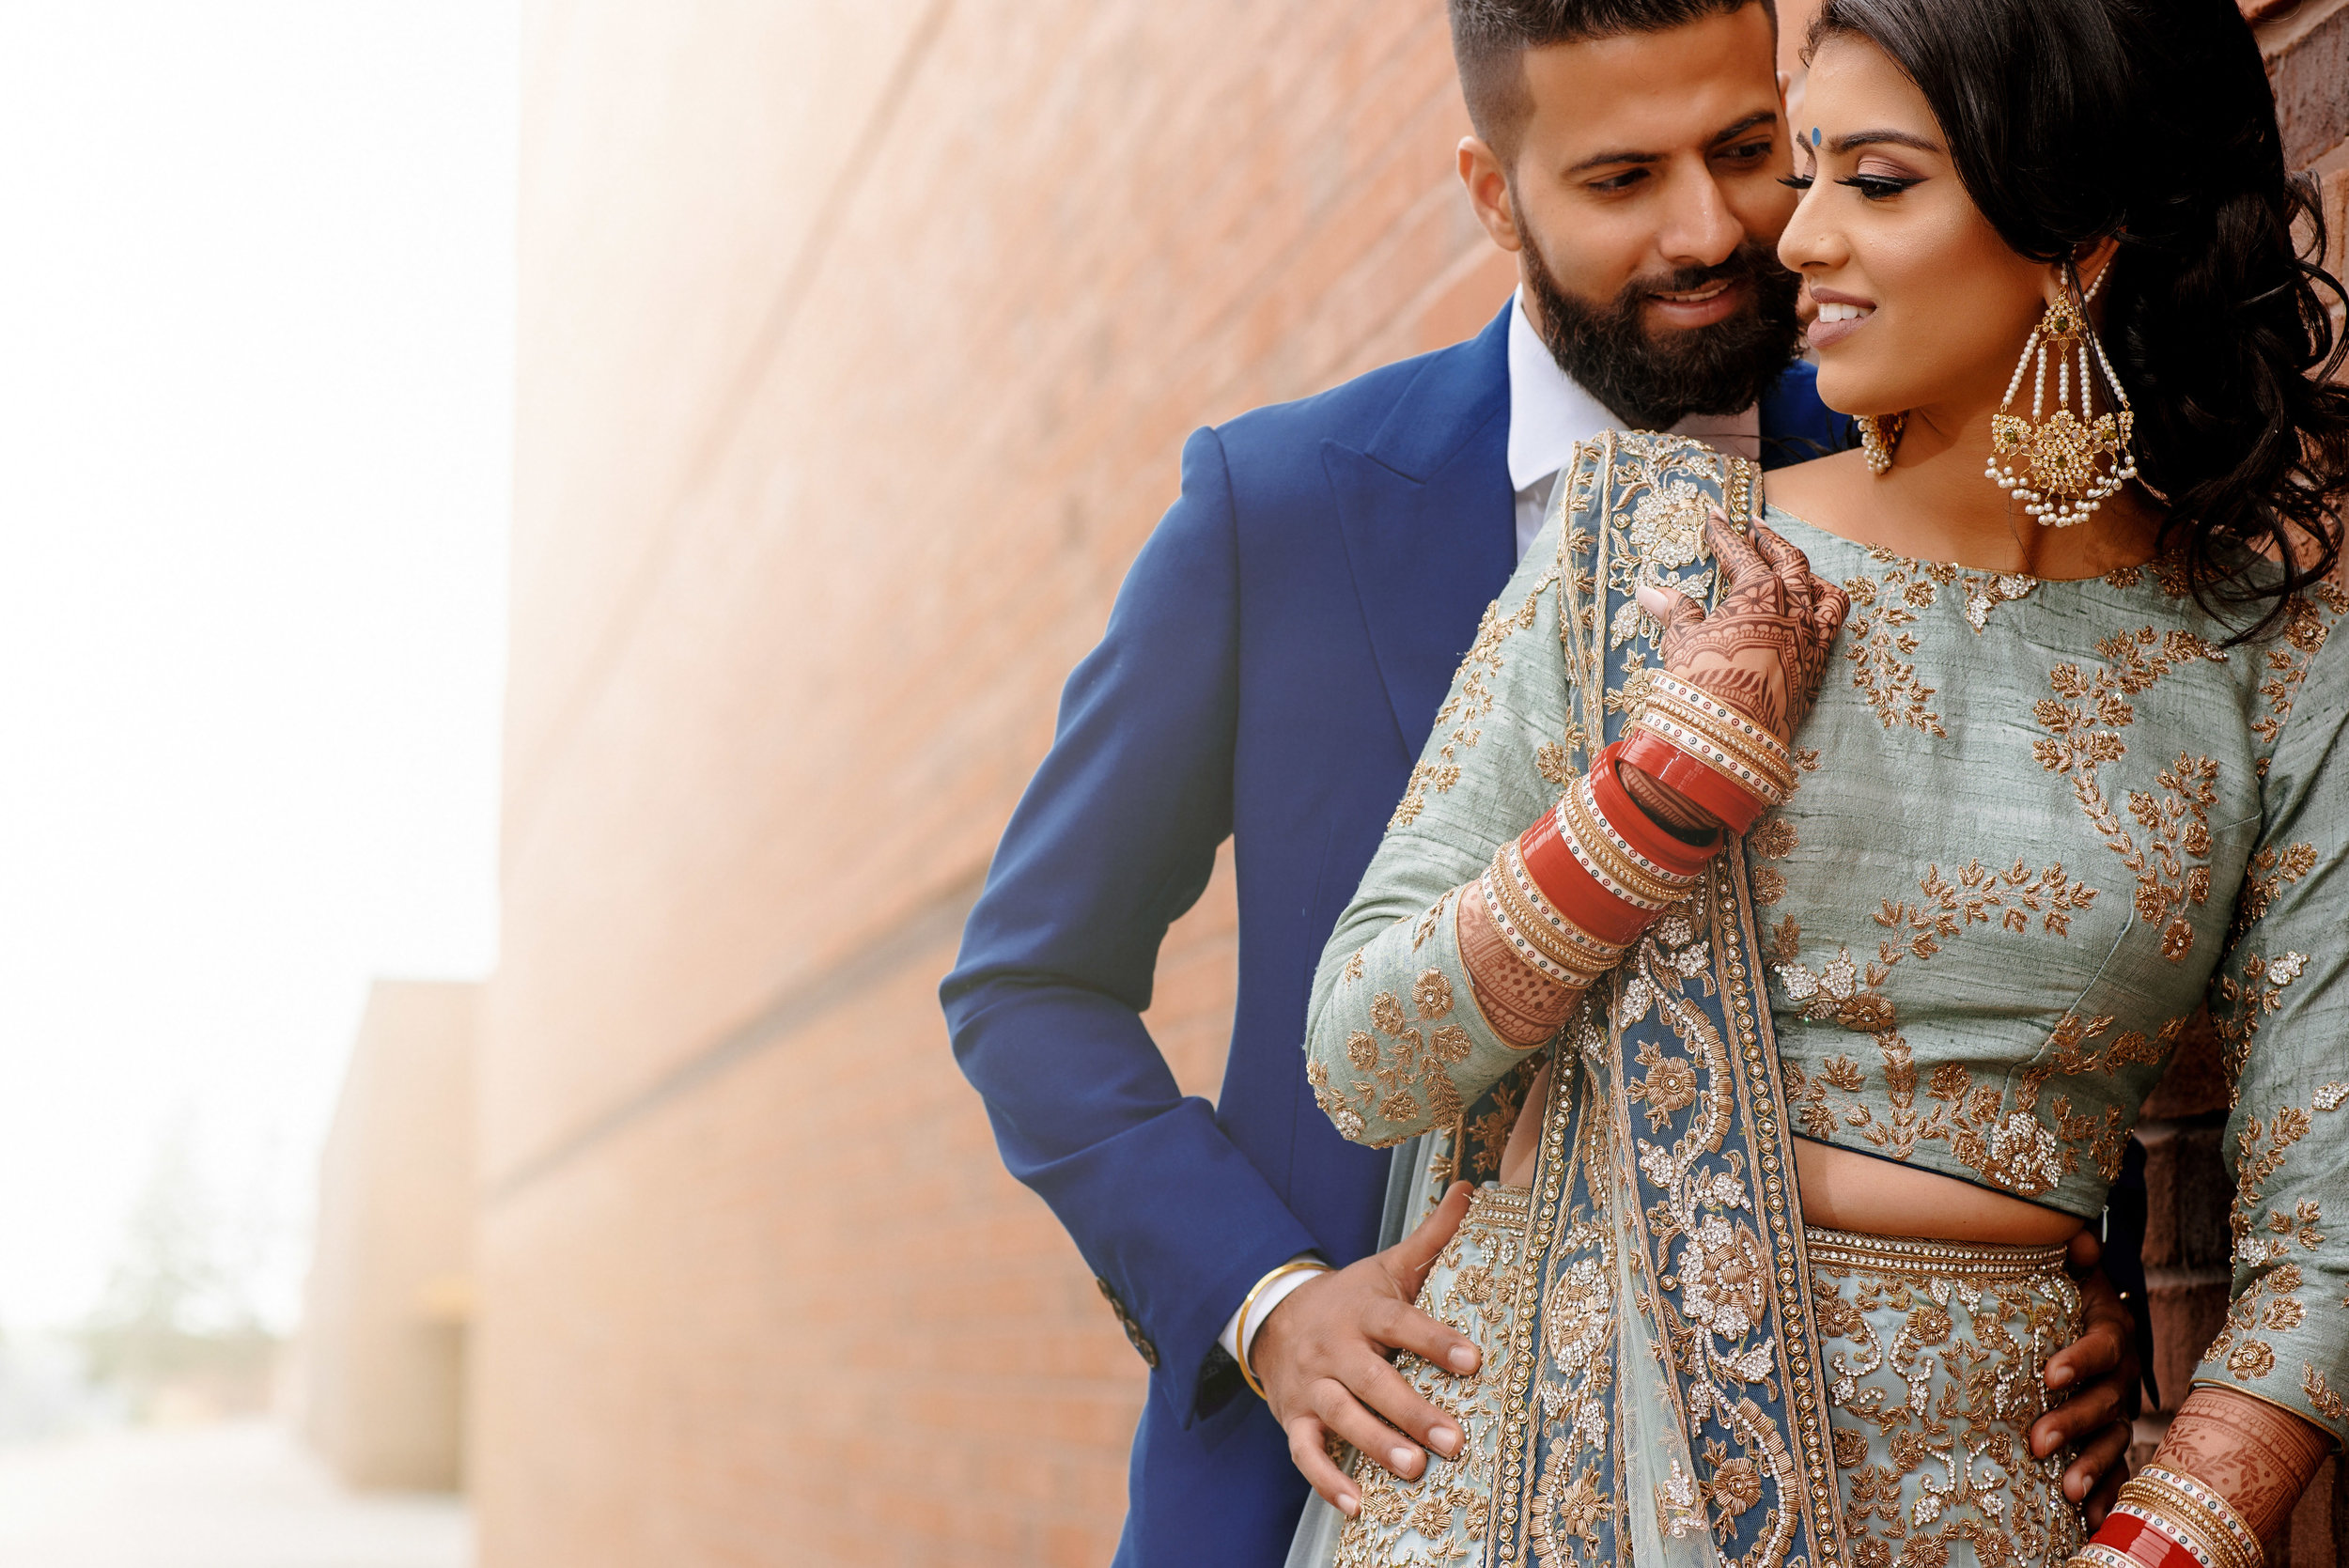 2018-06-24-Wedding-Jide Alakija-Toronto-Anmol and Simran-02241.jpg